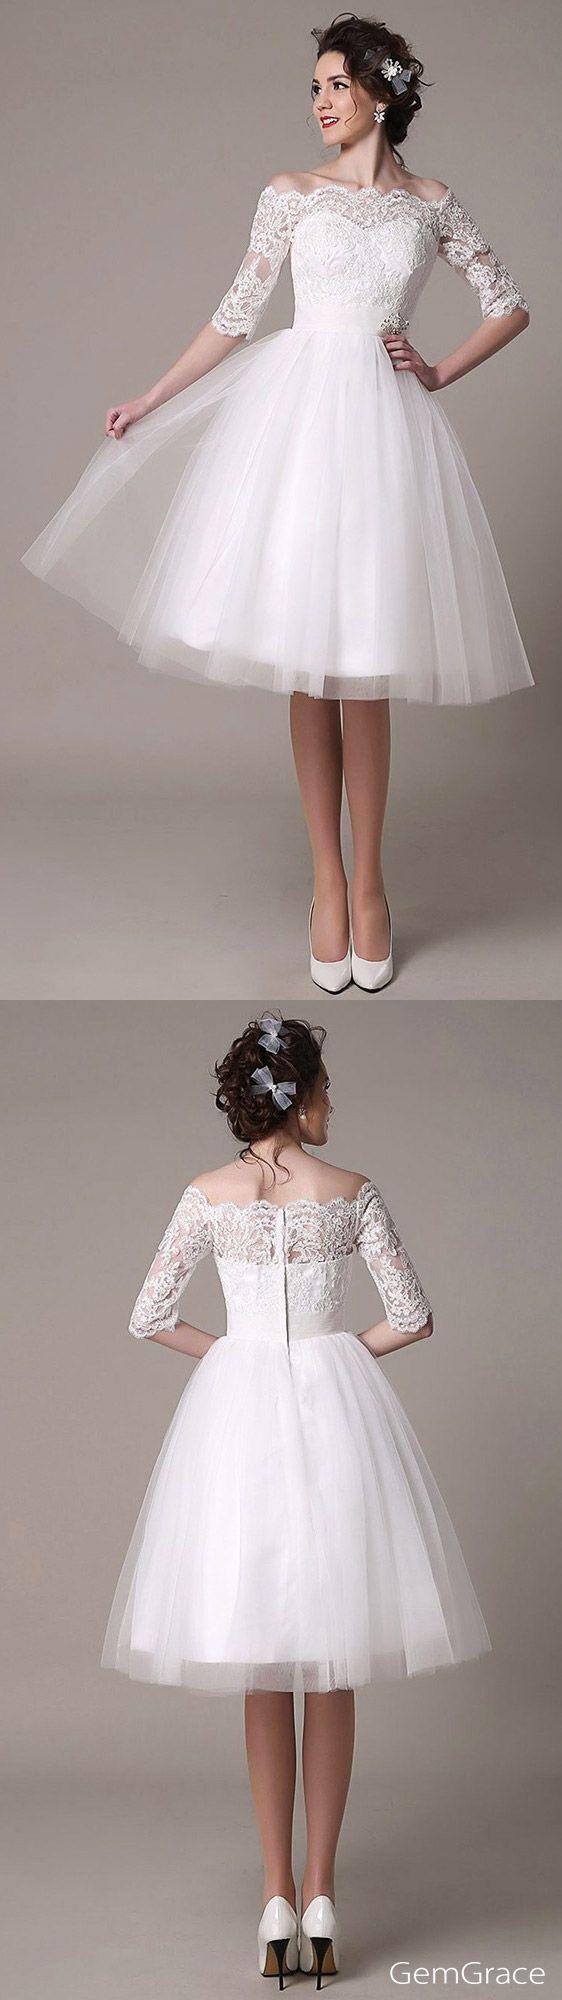 Vintage Short Wedding Dress I Love Vintage This Beautiful Knee